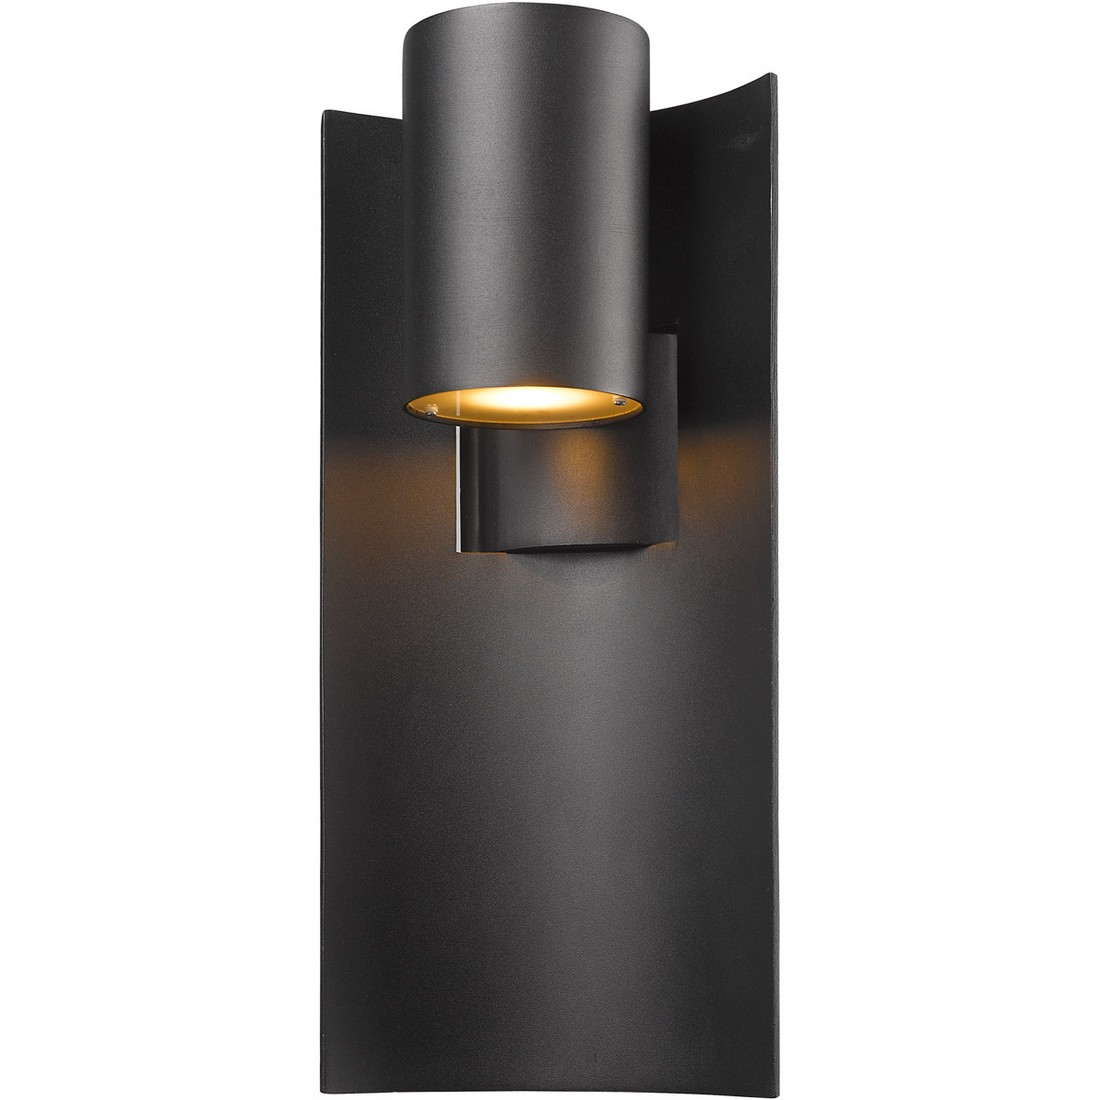 Brushed Aluminum Z-Lite 560CHB-BA-LED Outdoor LED Chain Hung Light